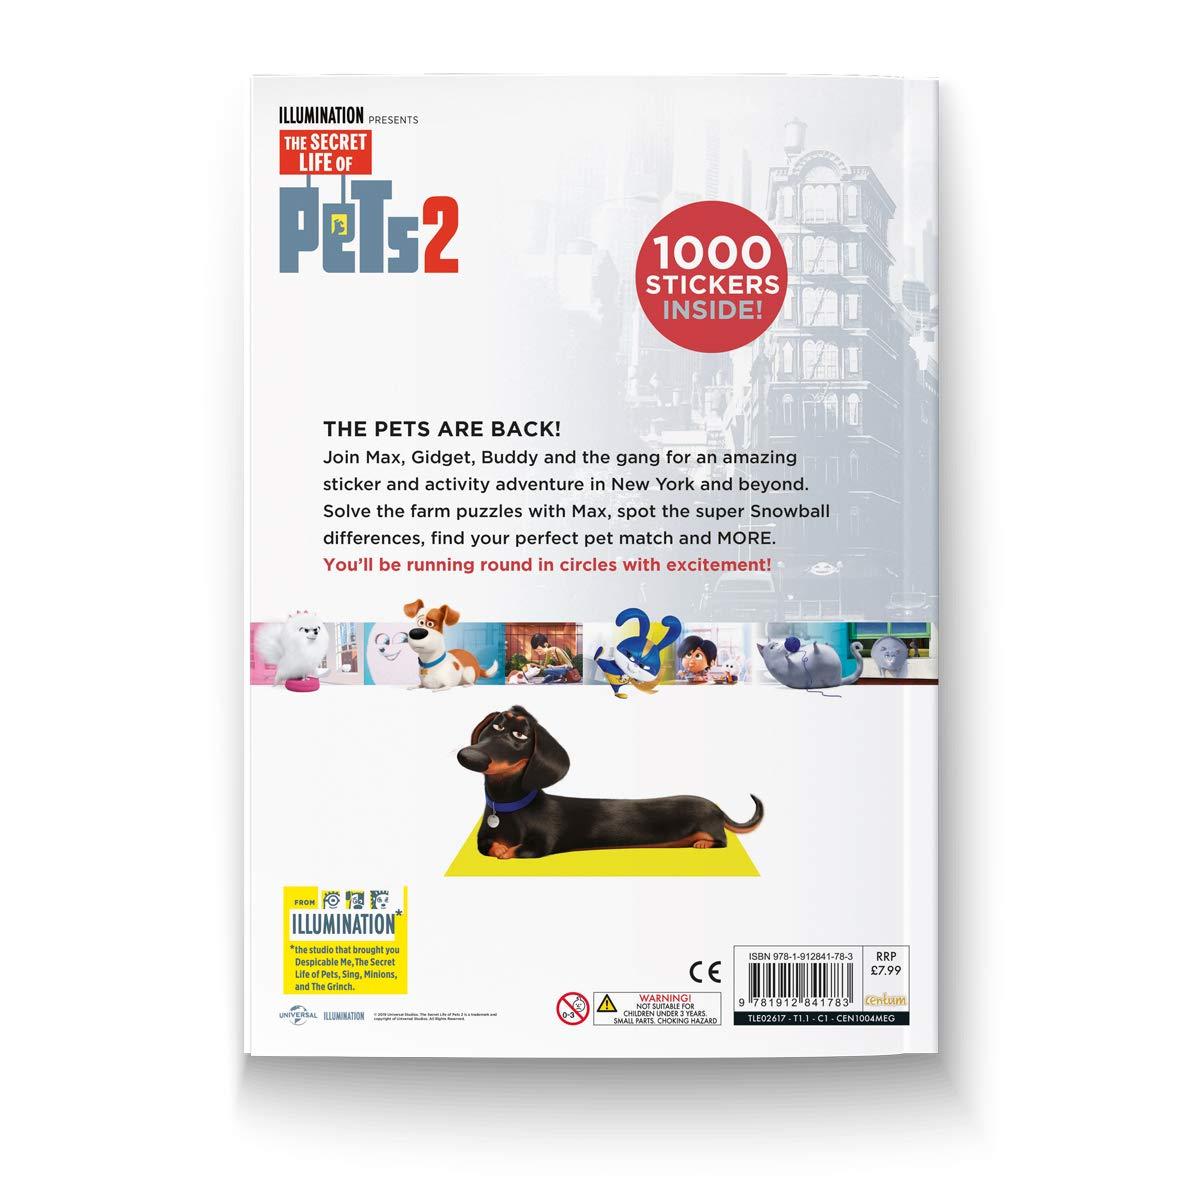 Universal Studios The Secret Life of Pets Sticker Paradise